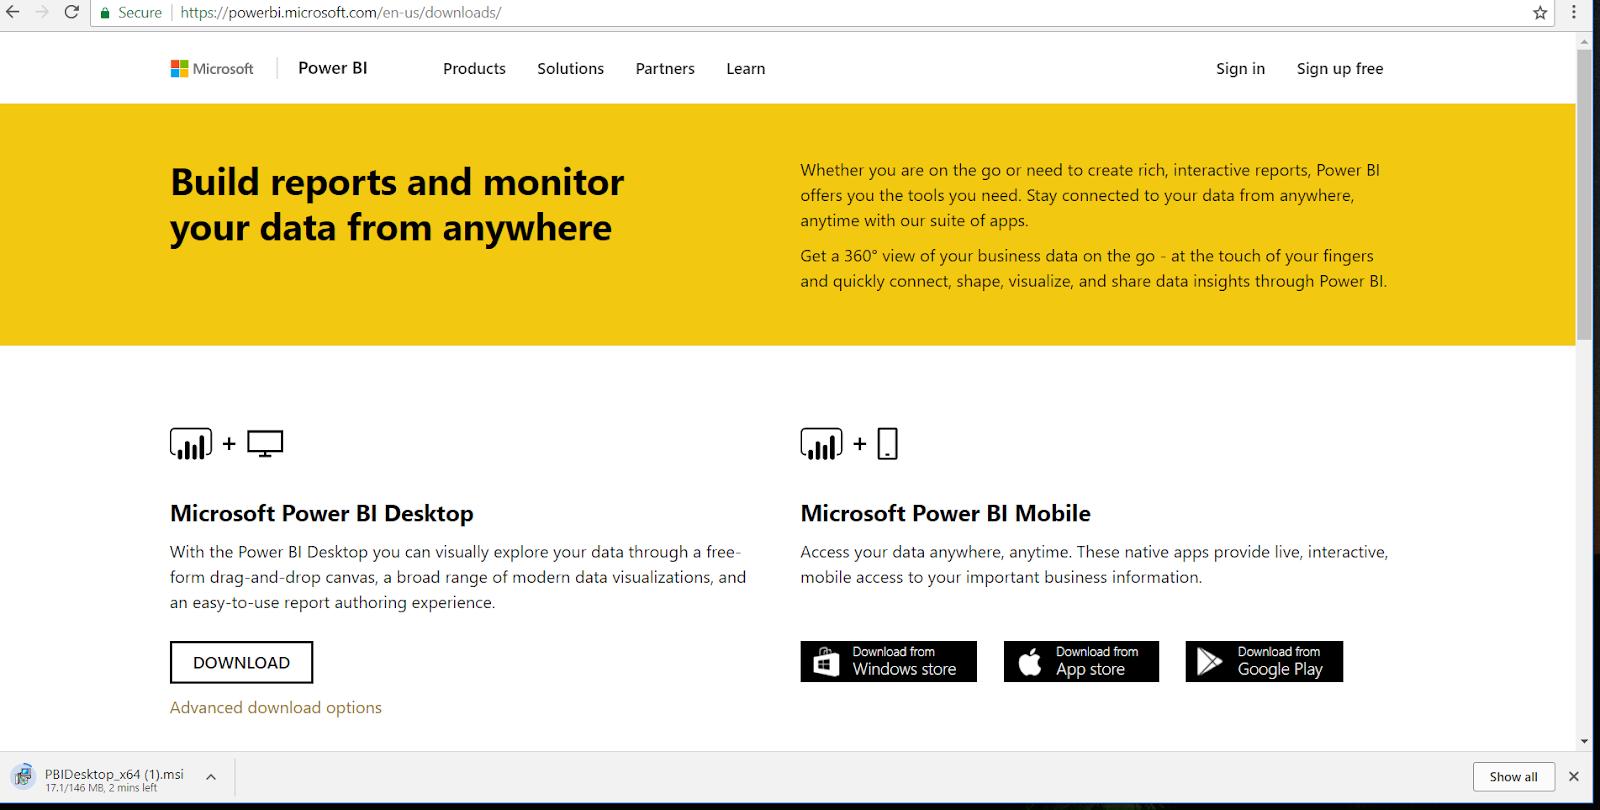 Microsoft Power BI Installation & Pricing 29